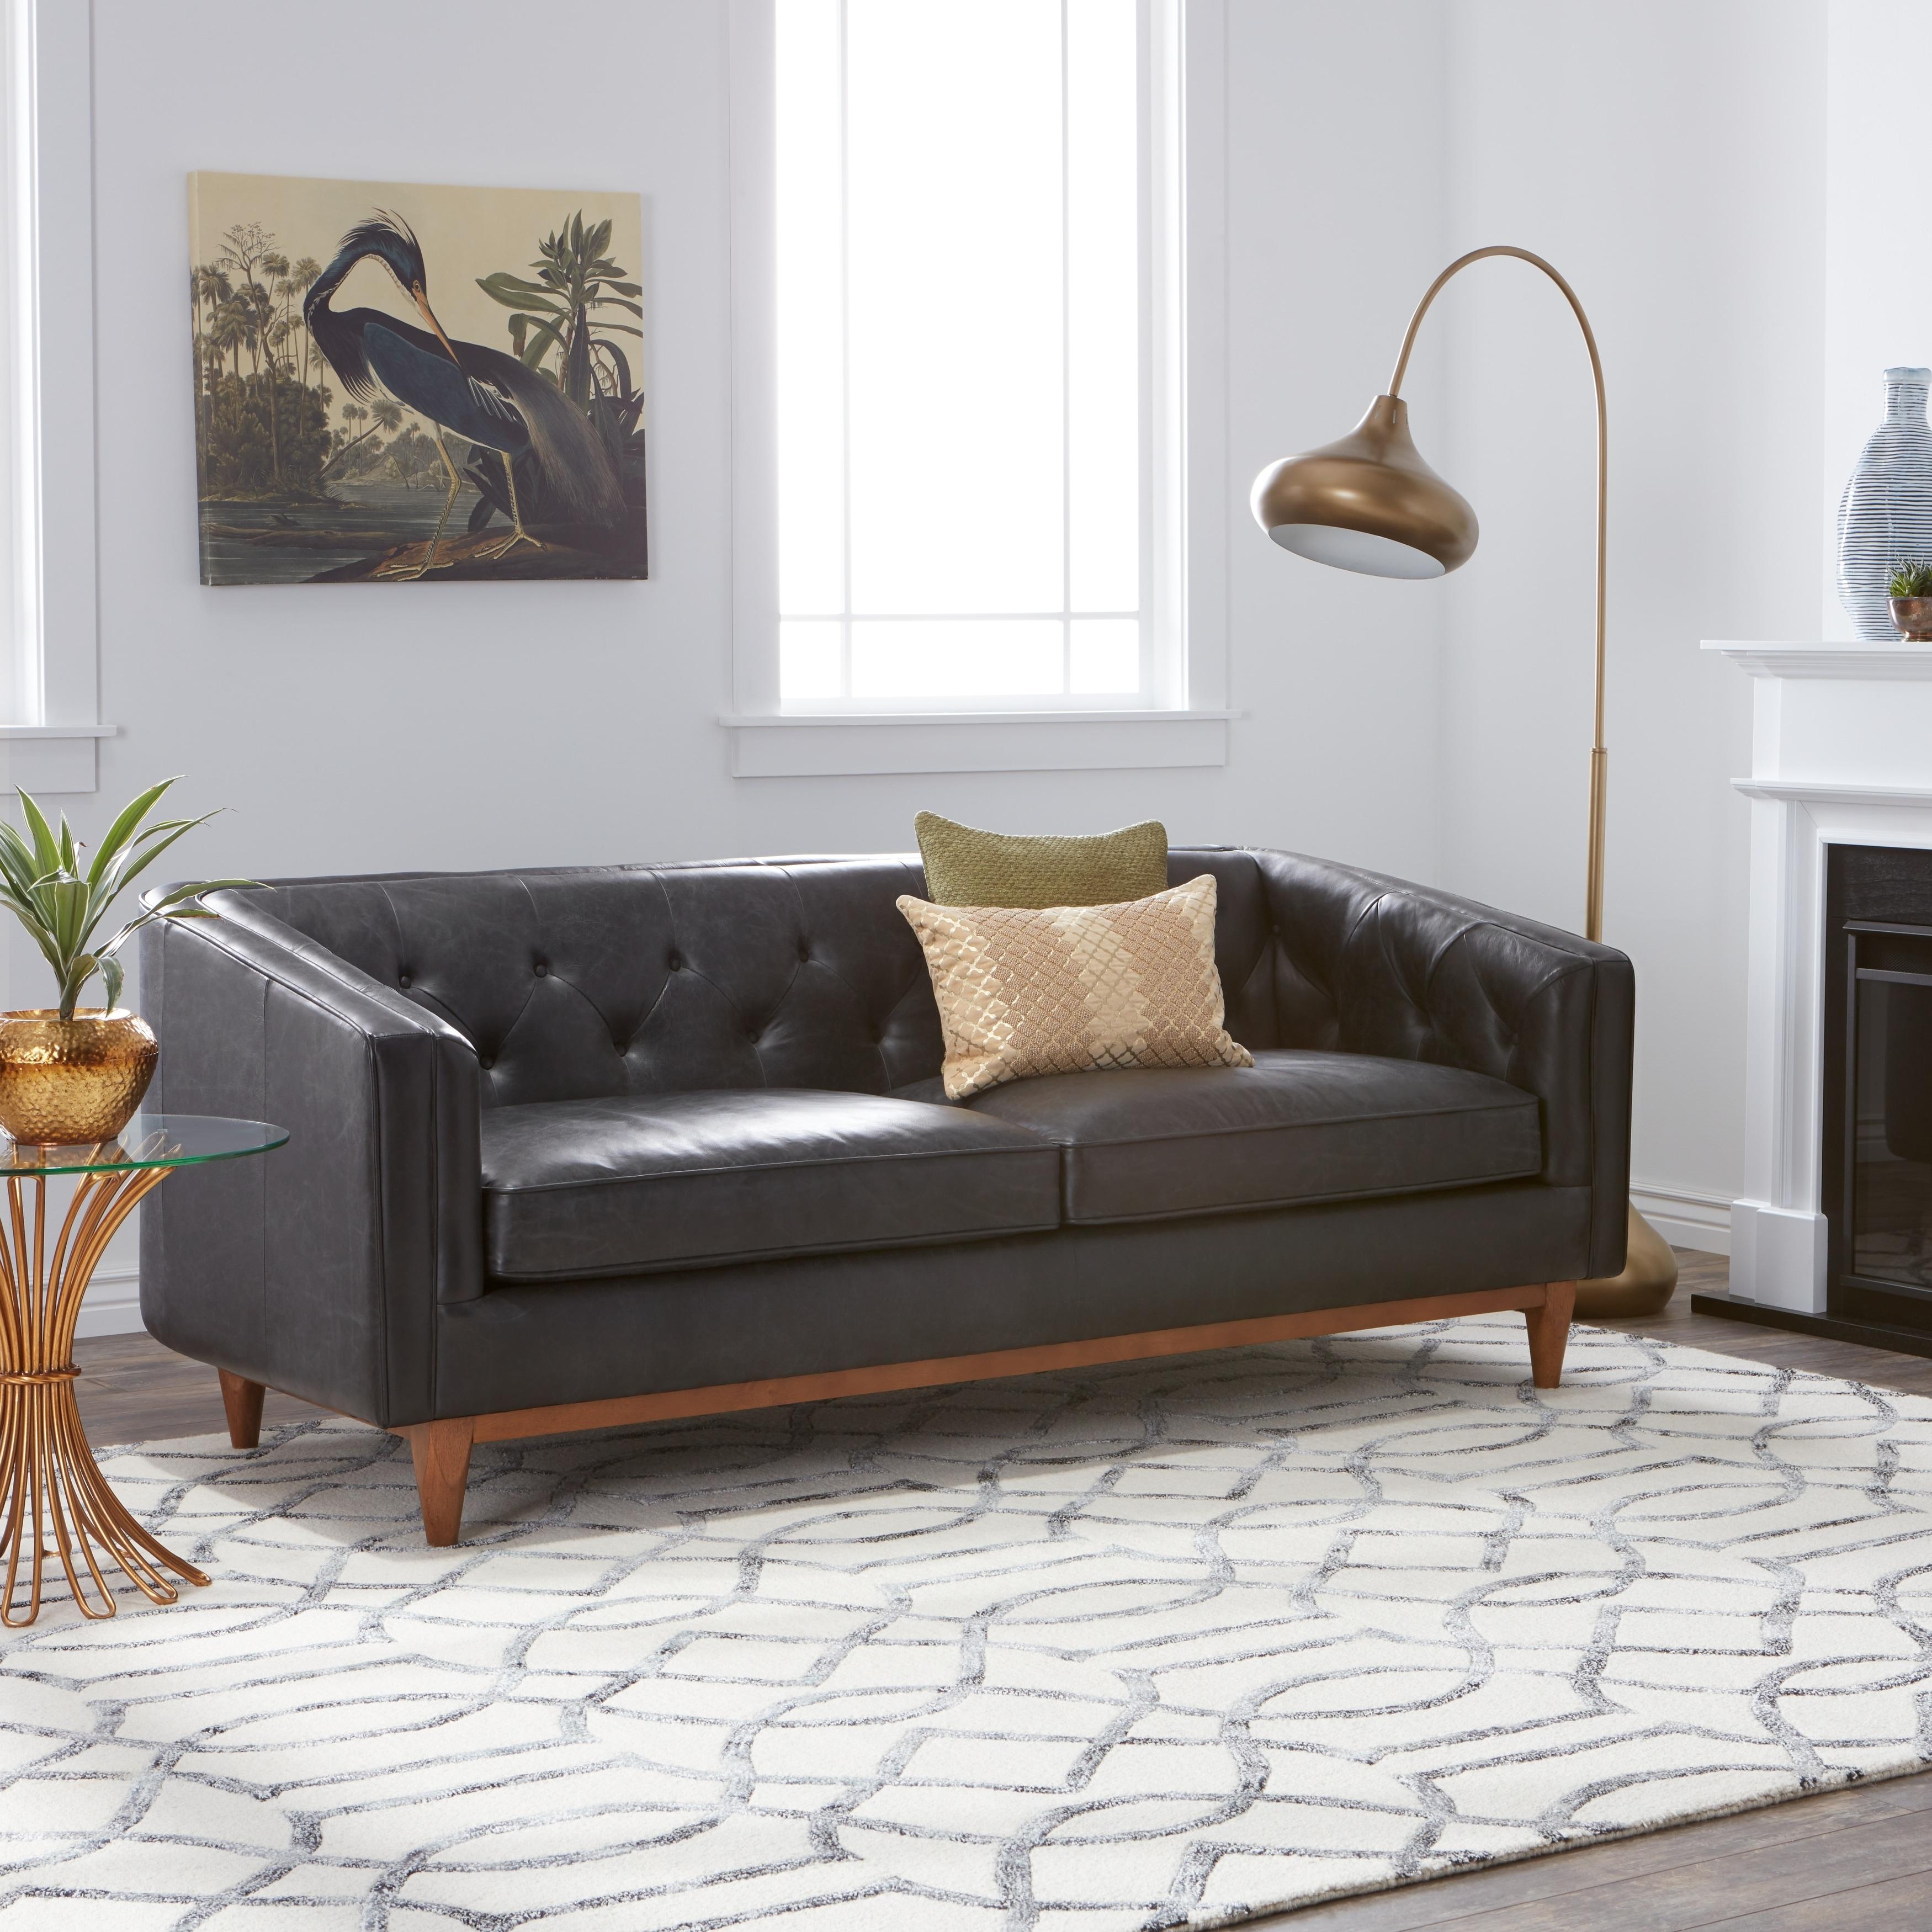 shop strick bolton natty black button tufted leather sofa free rh overstock com